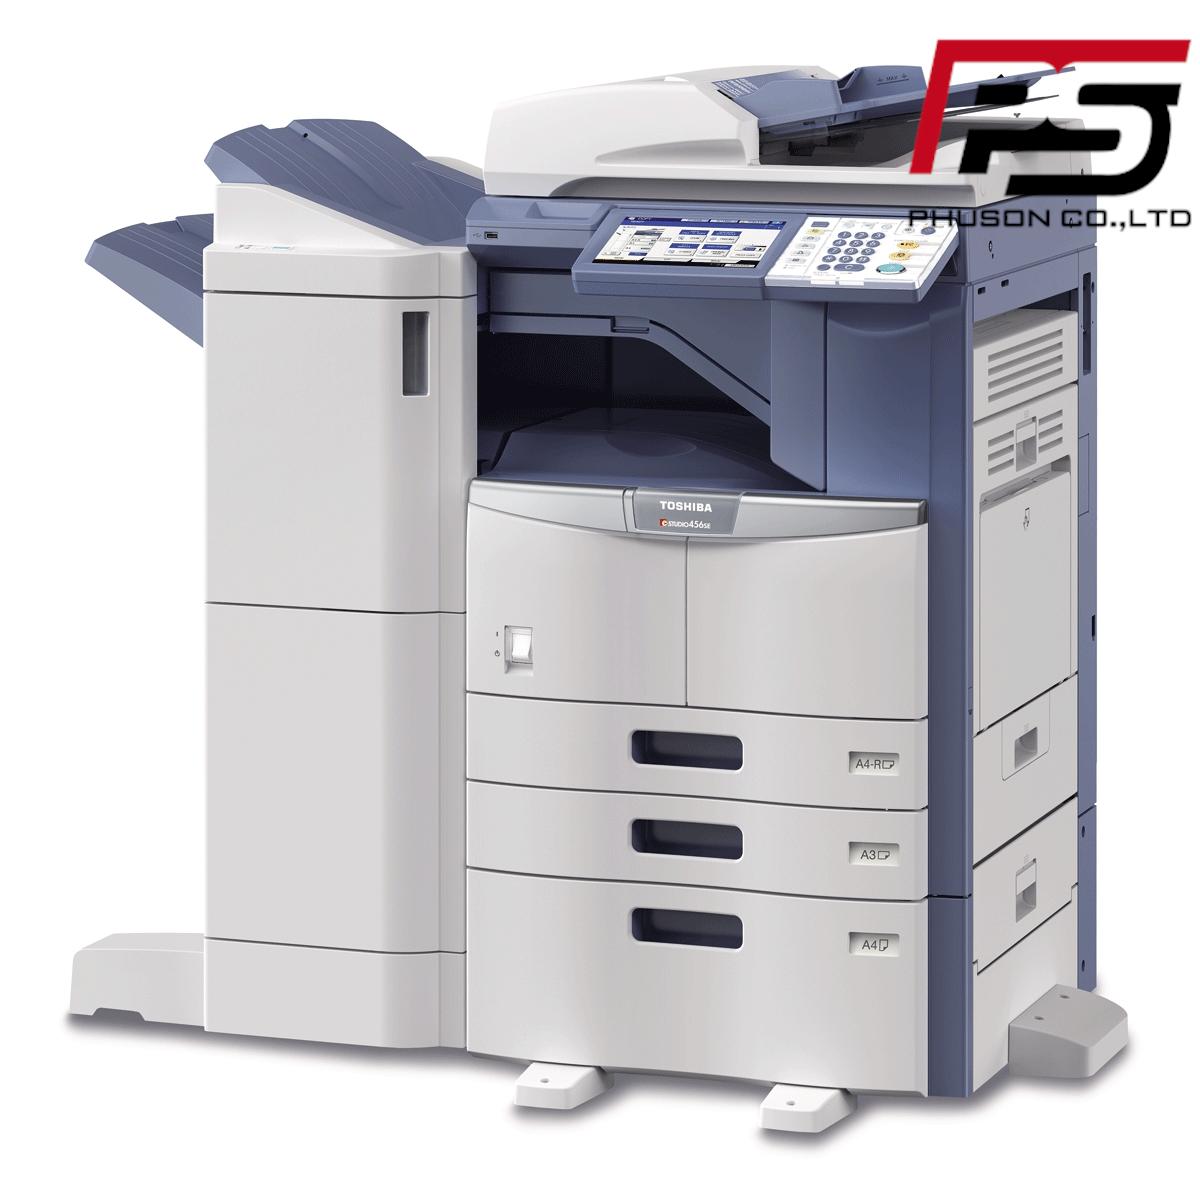 Thuê máy Photocopy Toshiba e-Studio 456